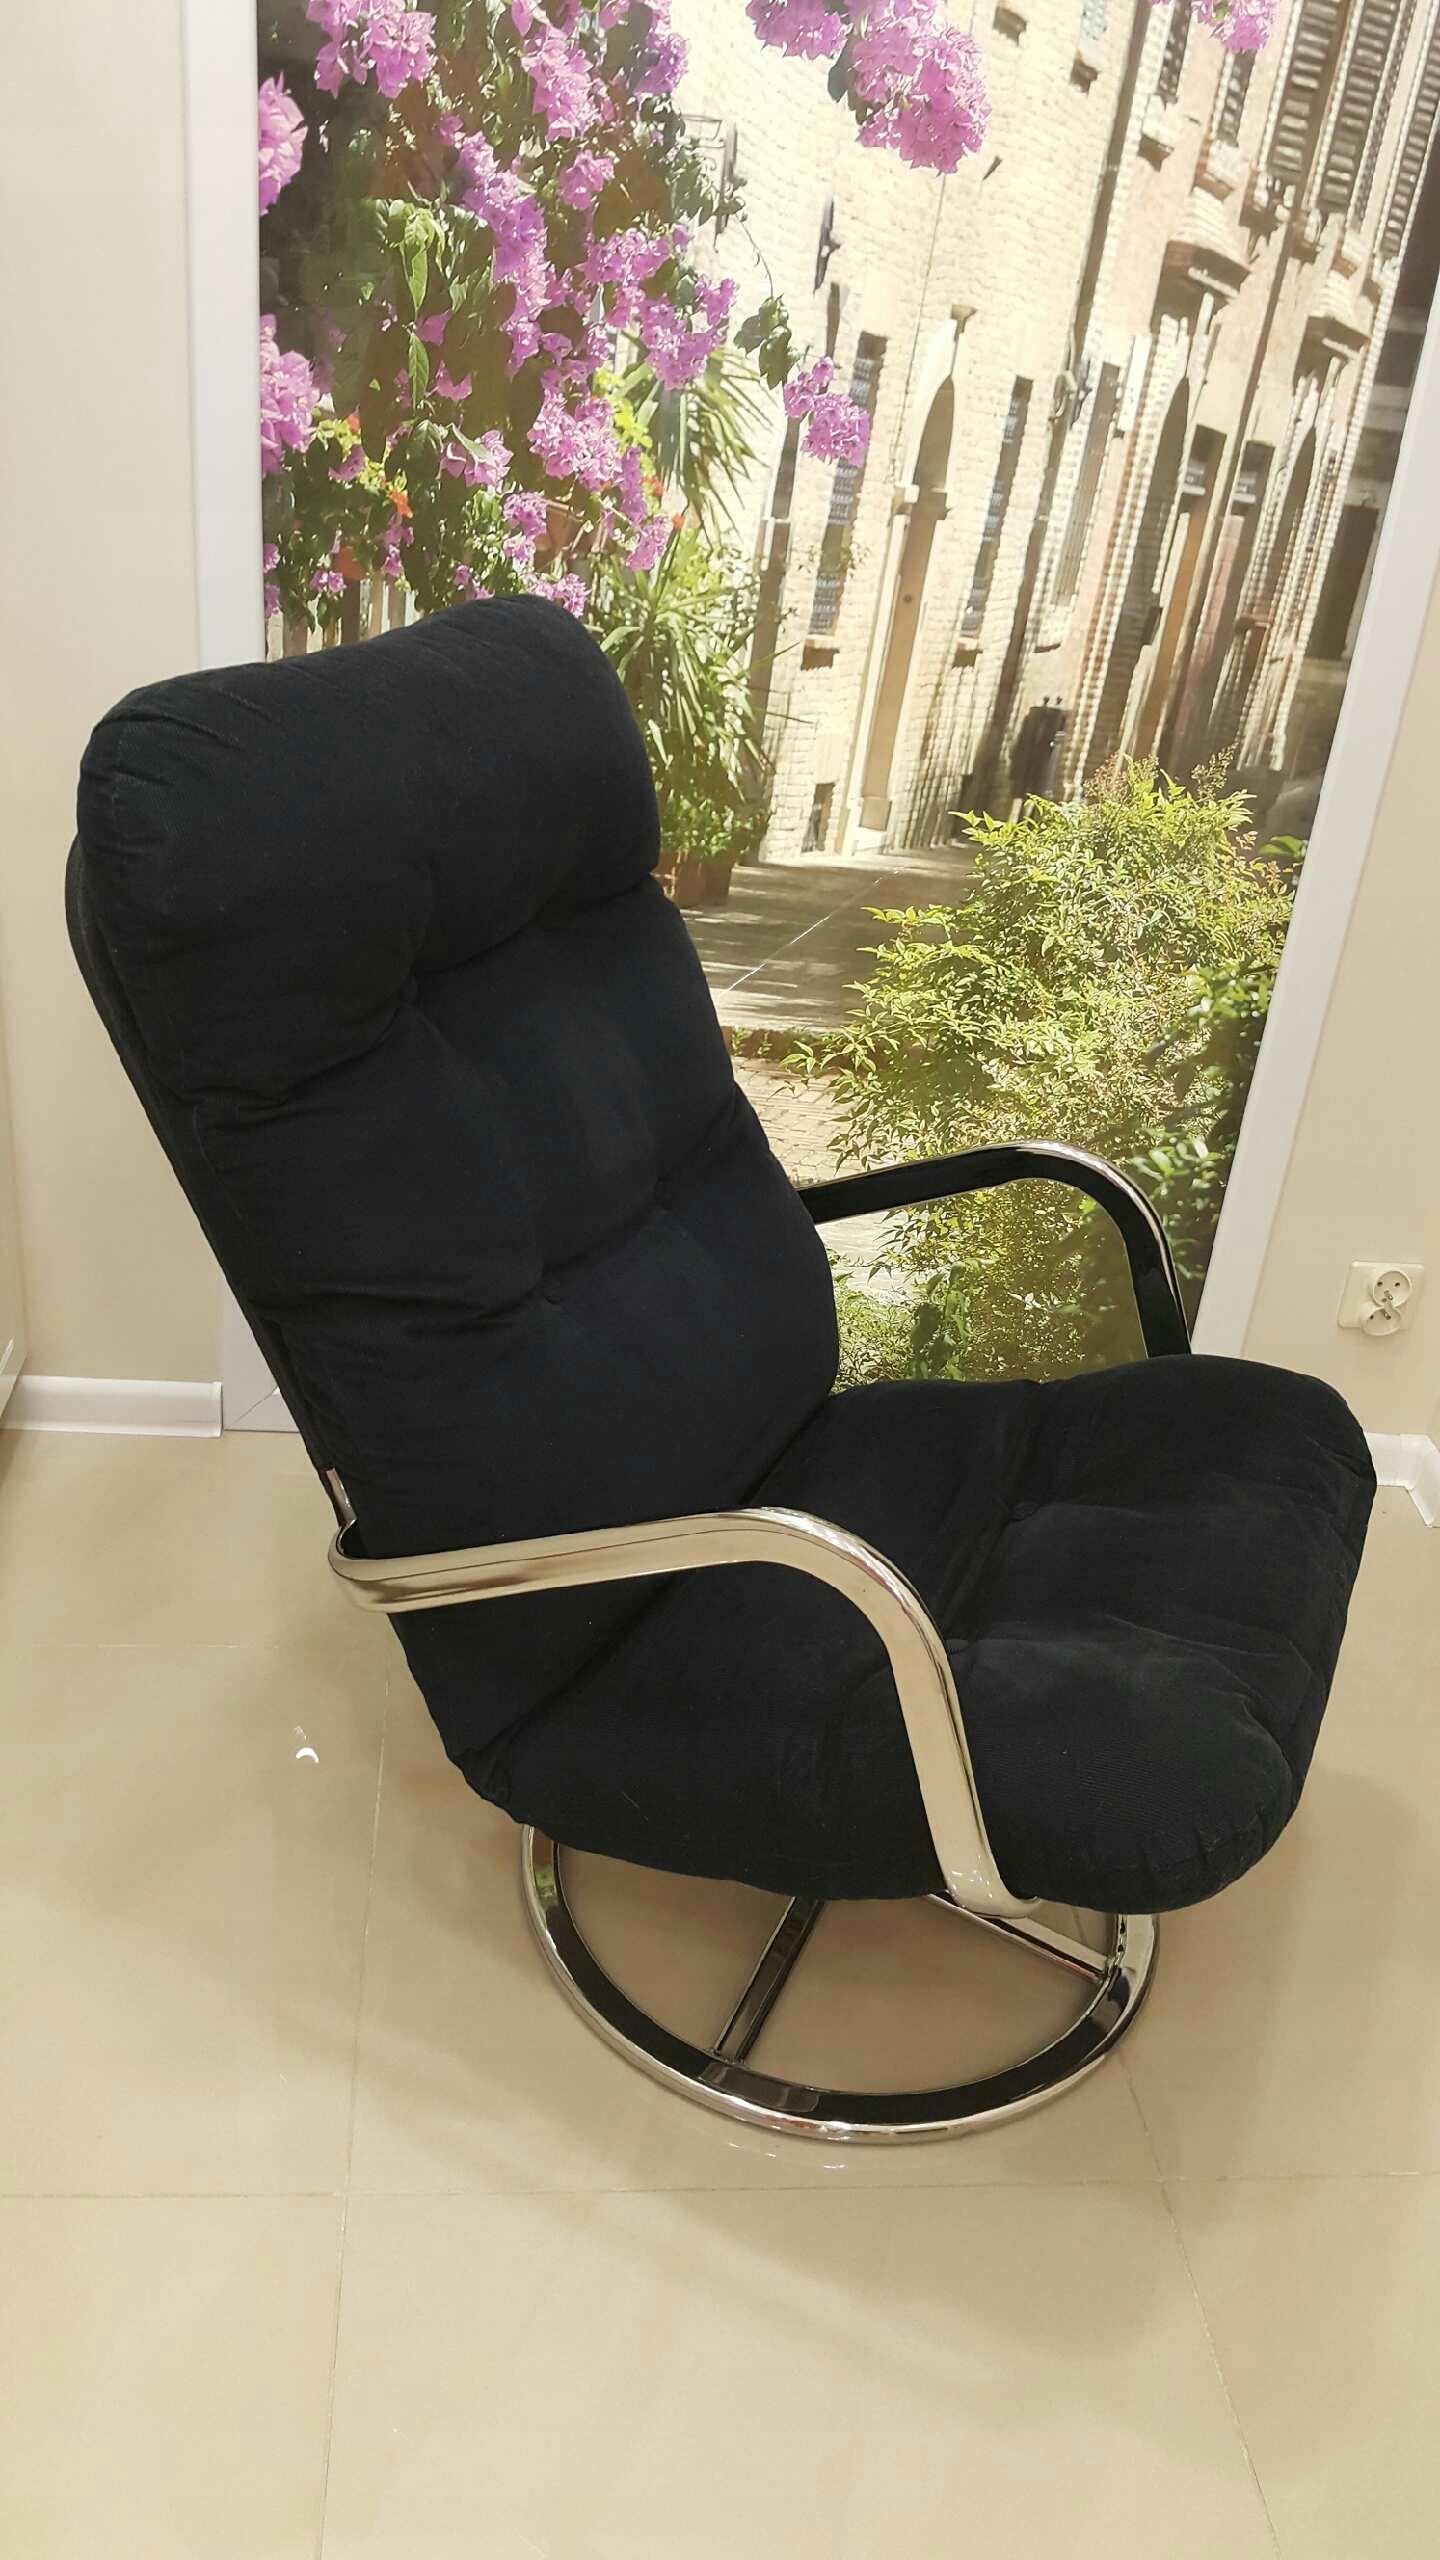 Ikea Smedsta 2 Fotele Obrotowe Czarne 7830756131